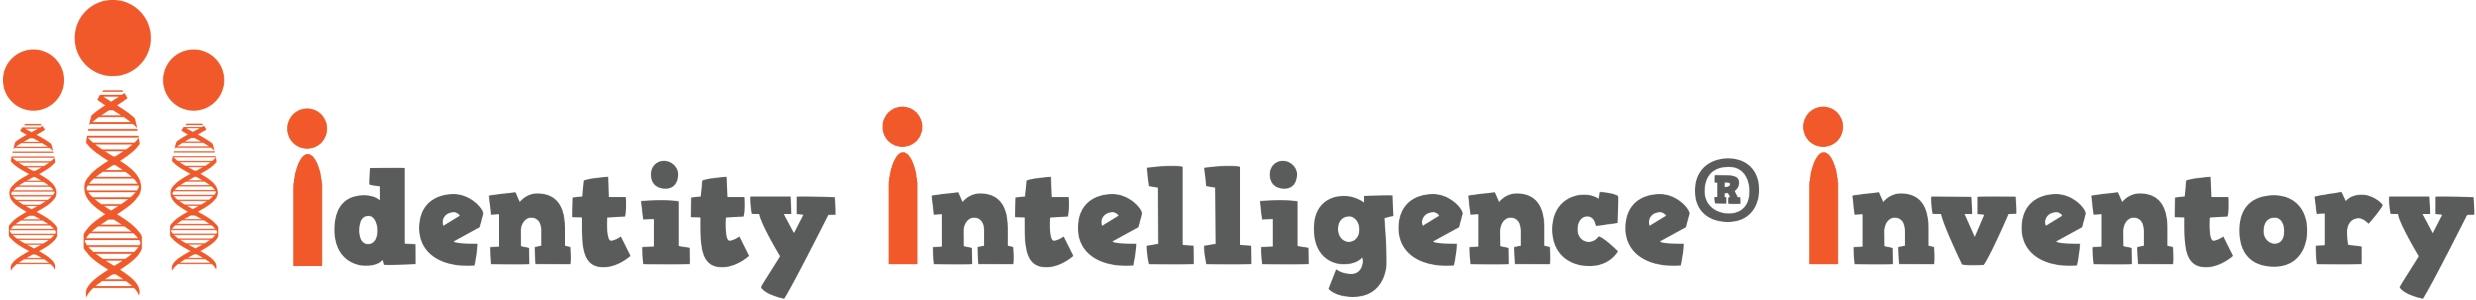 identity-intelligence-inventory-main-one-liner-orange-300.jpg